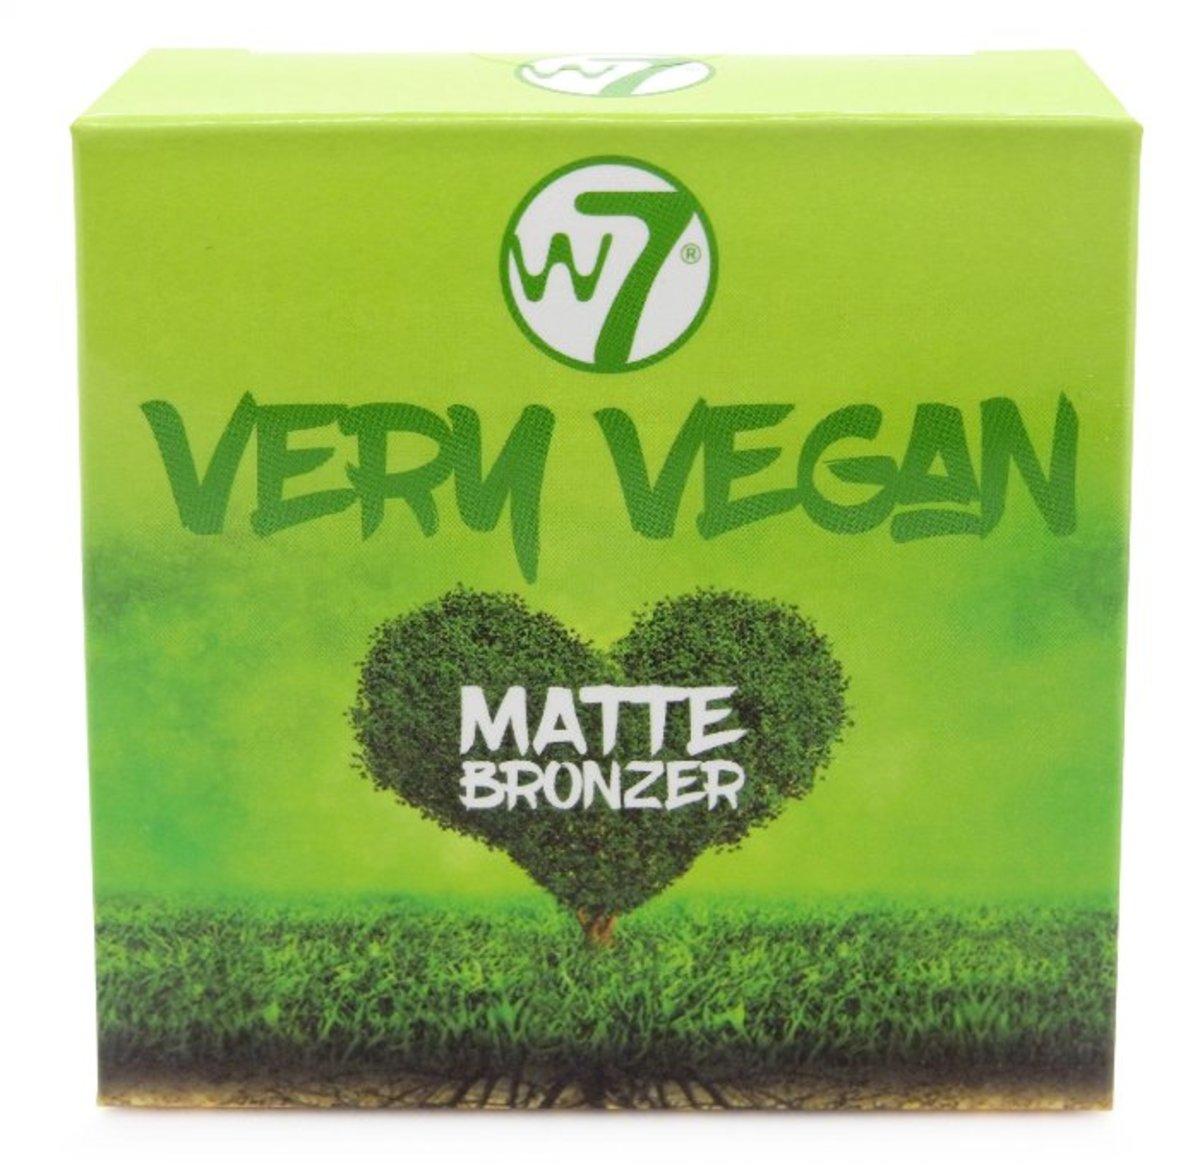 Very Vegan Matte Bronzer - Sun Kissed